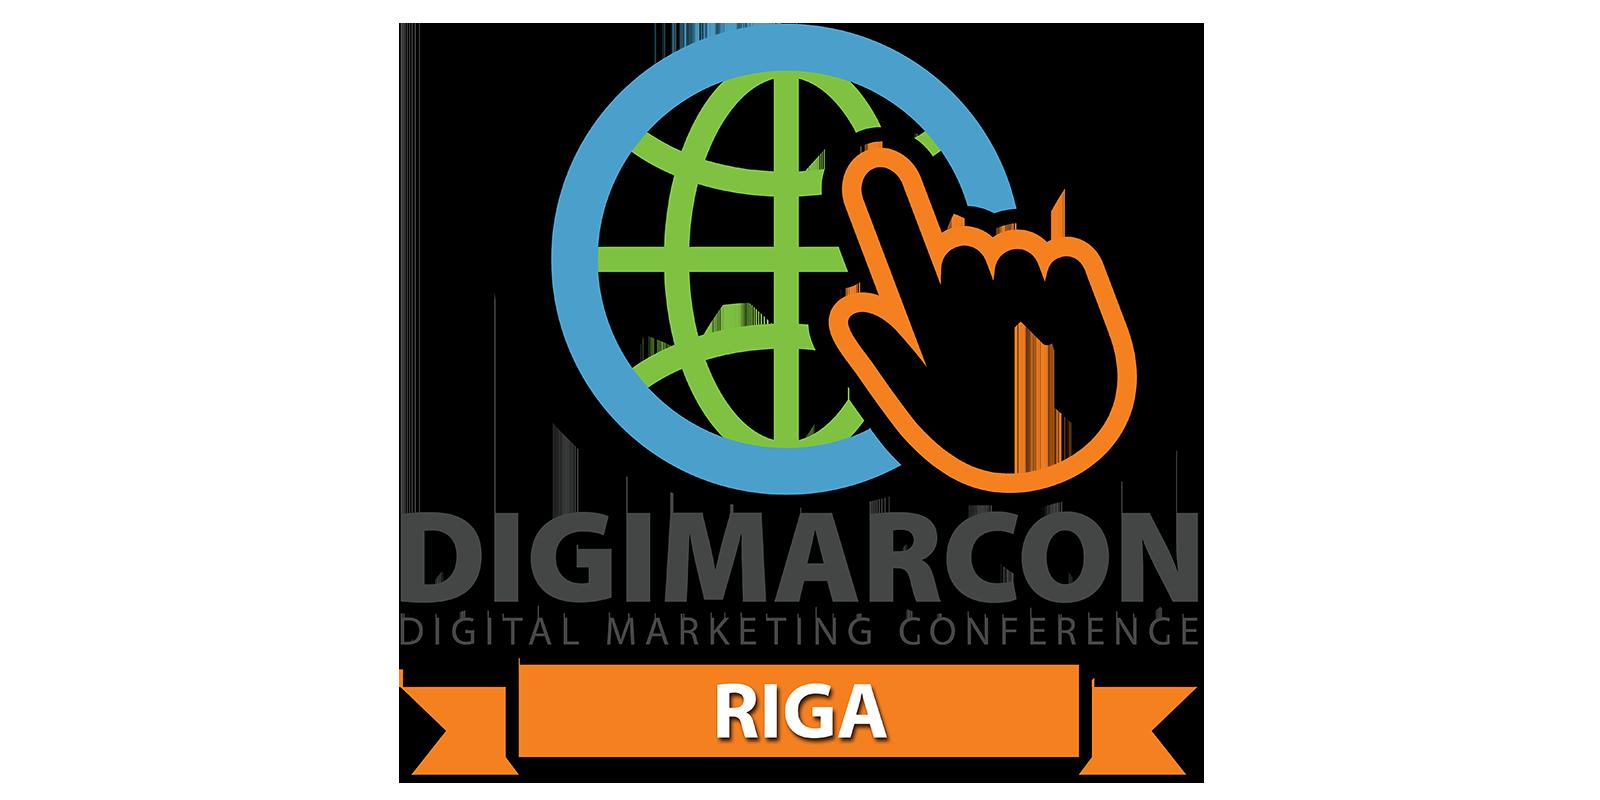 Riga Digital Marketing Conference